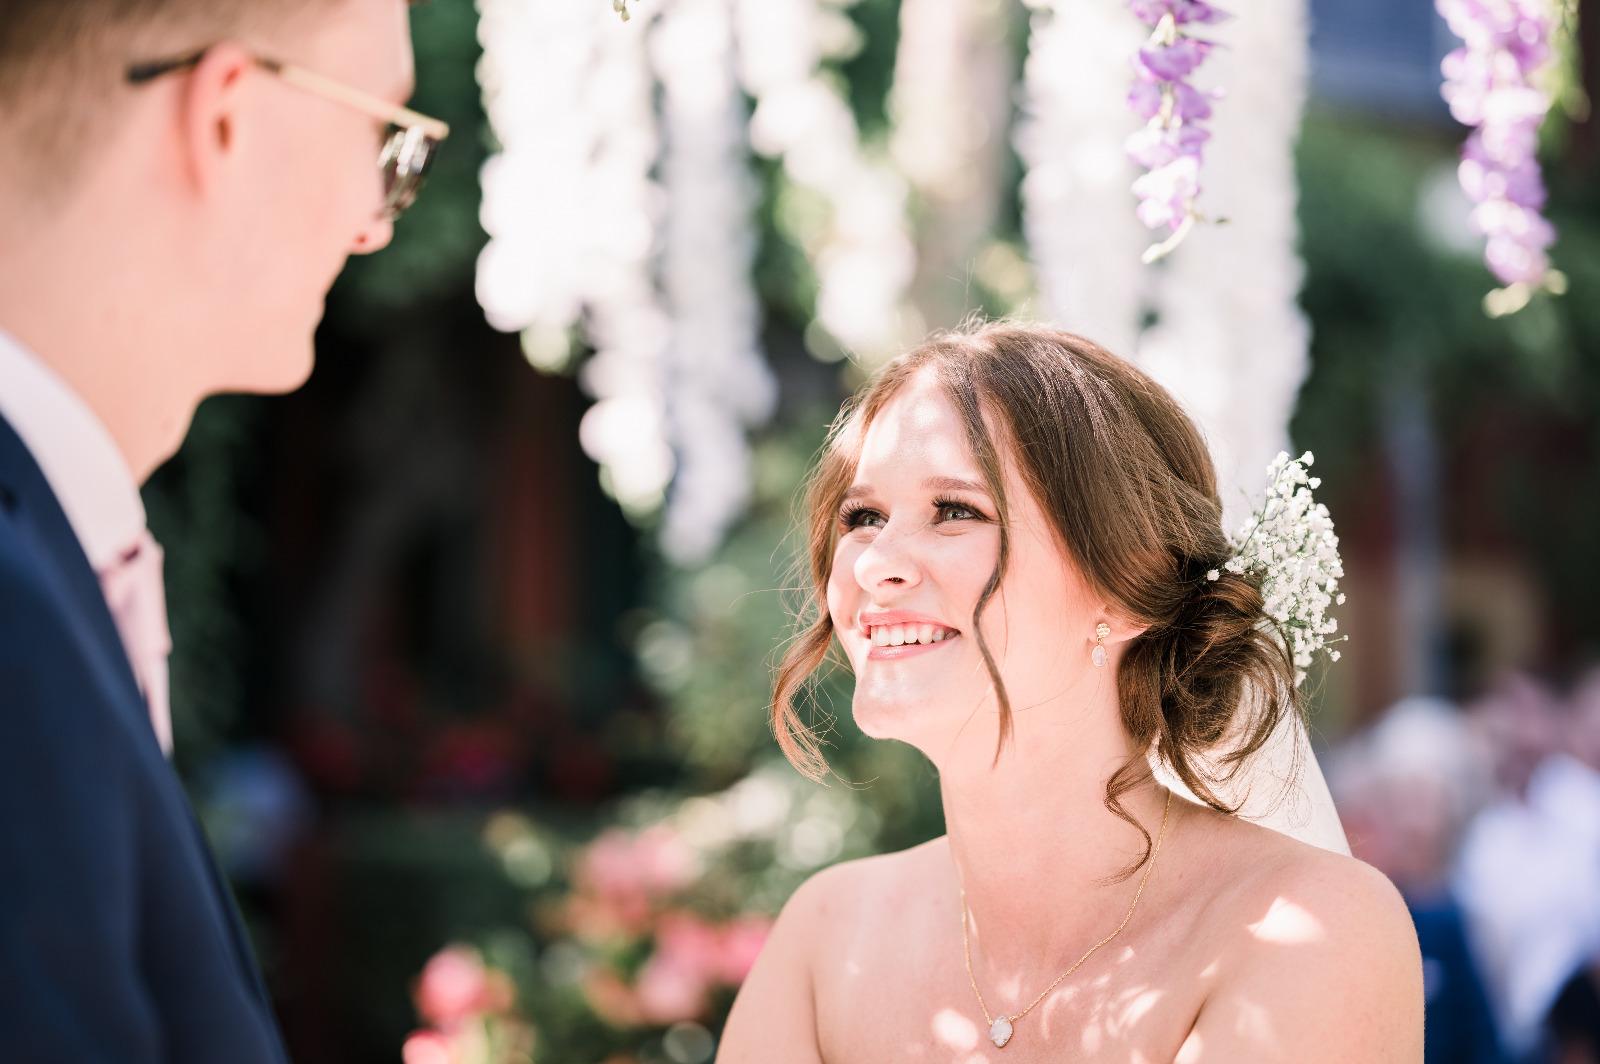 Holly our wonderful bride